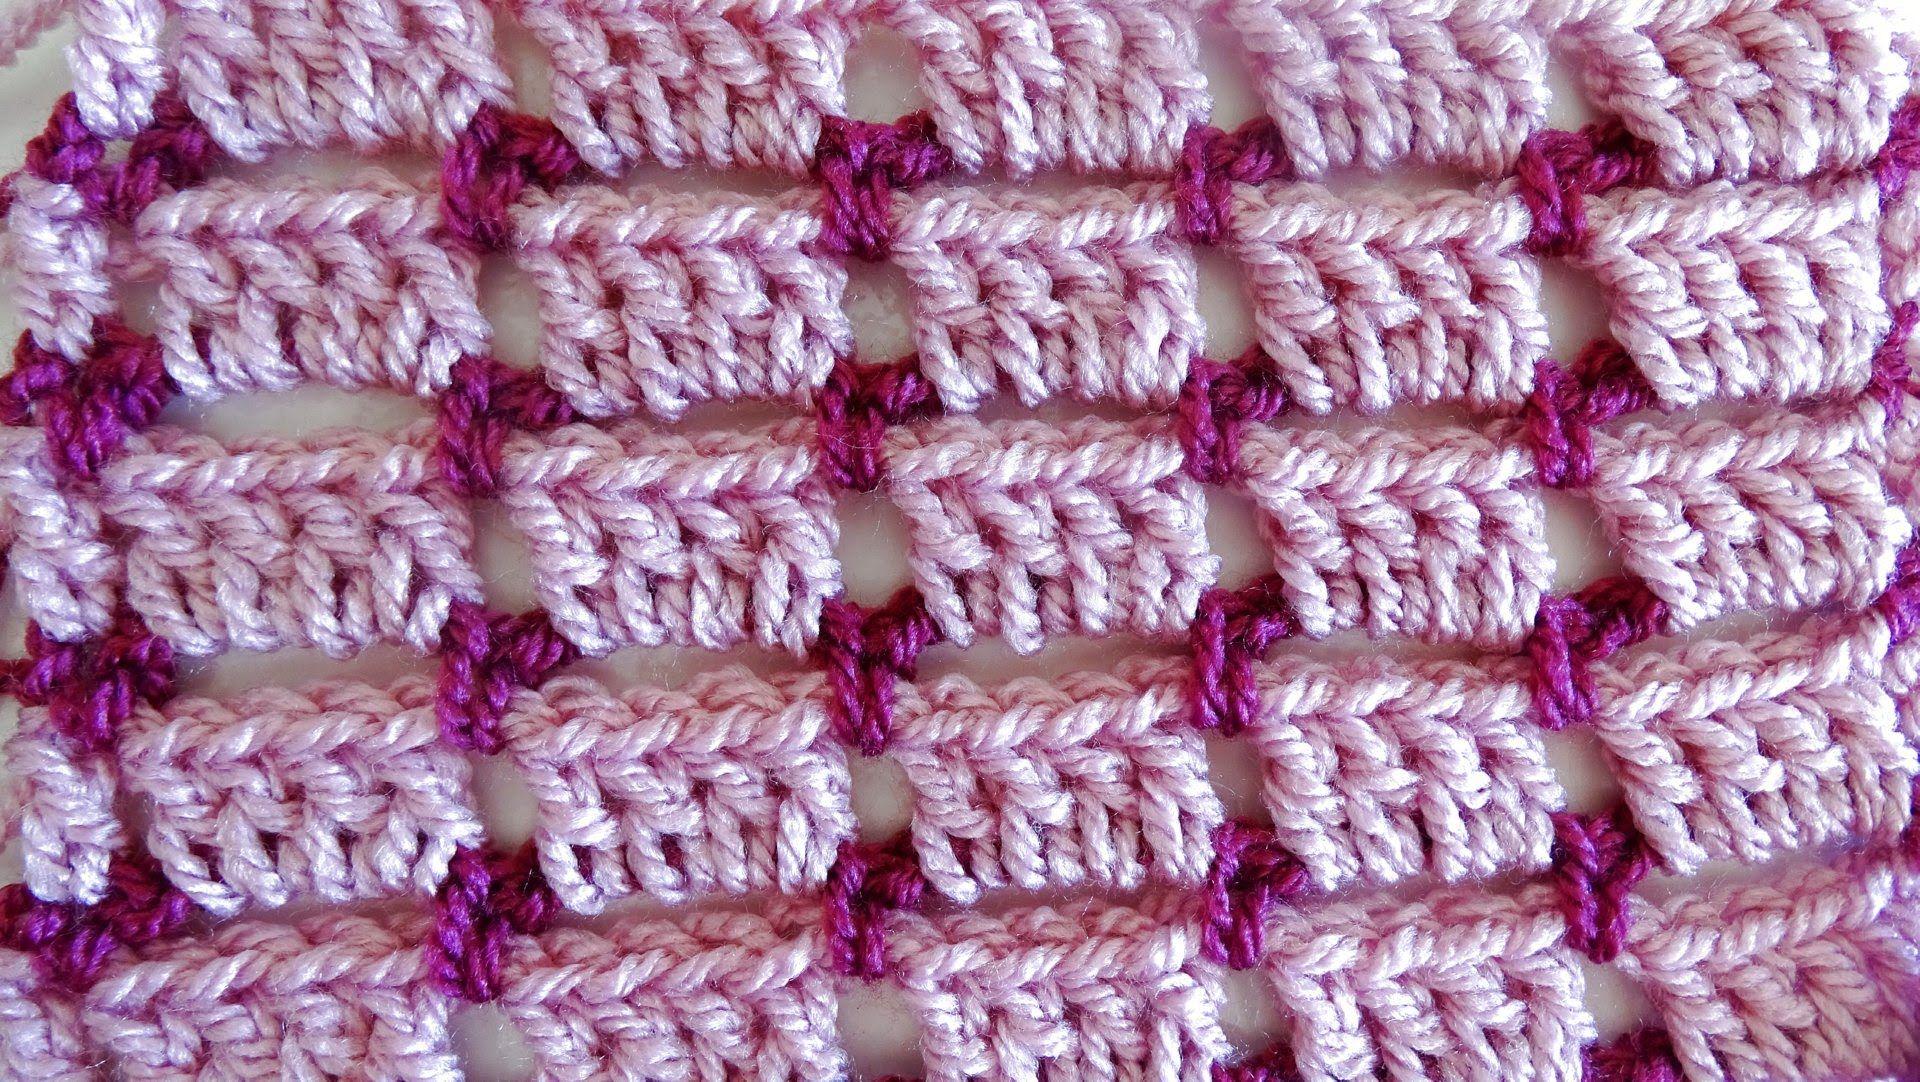 Crochet Block Stitch Crochet Tutorial Youtube Needle Art